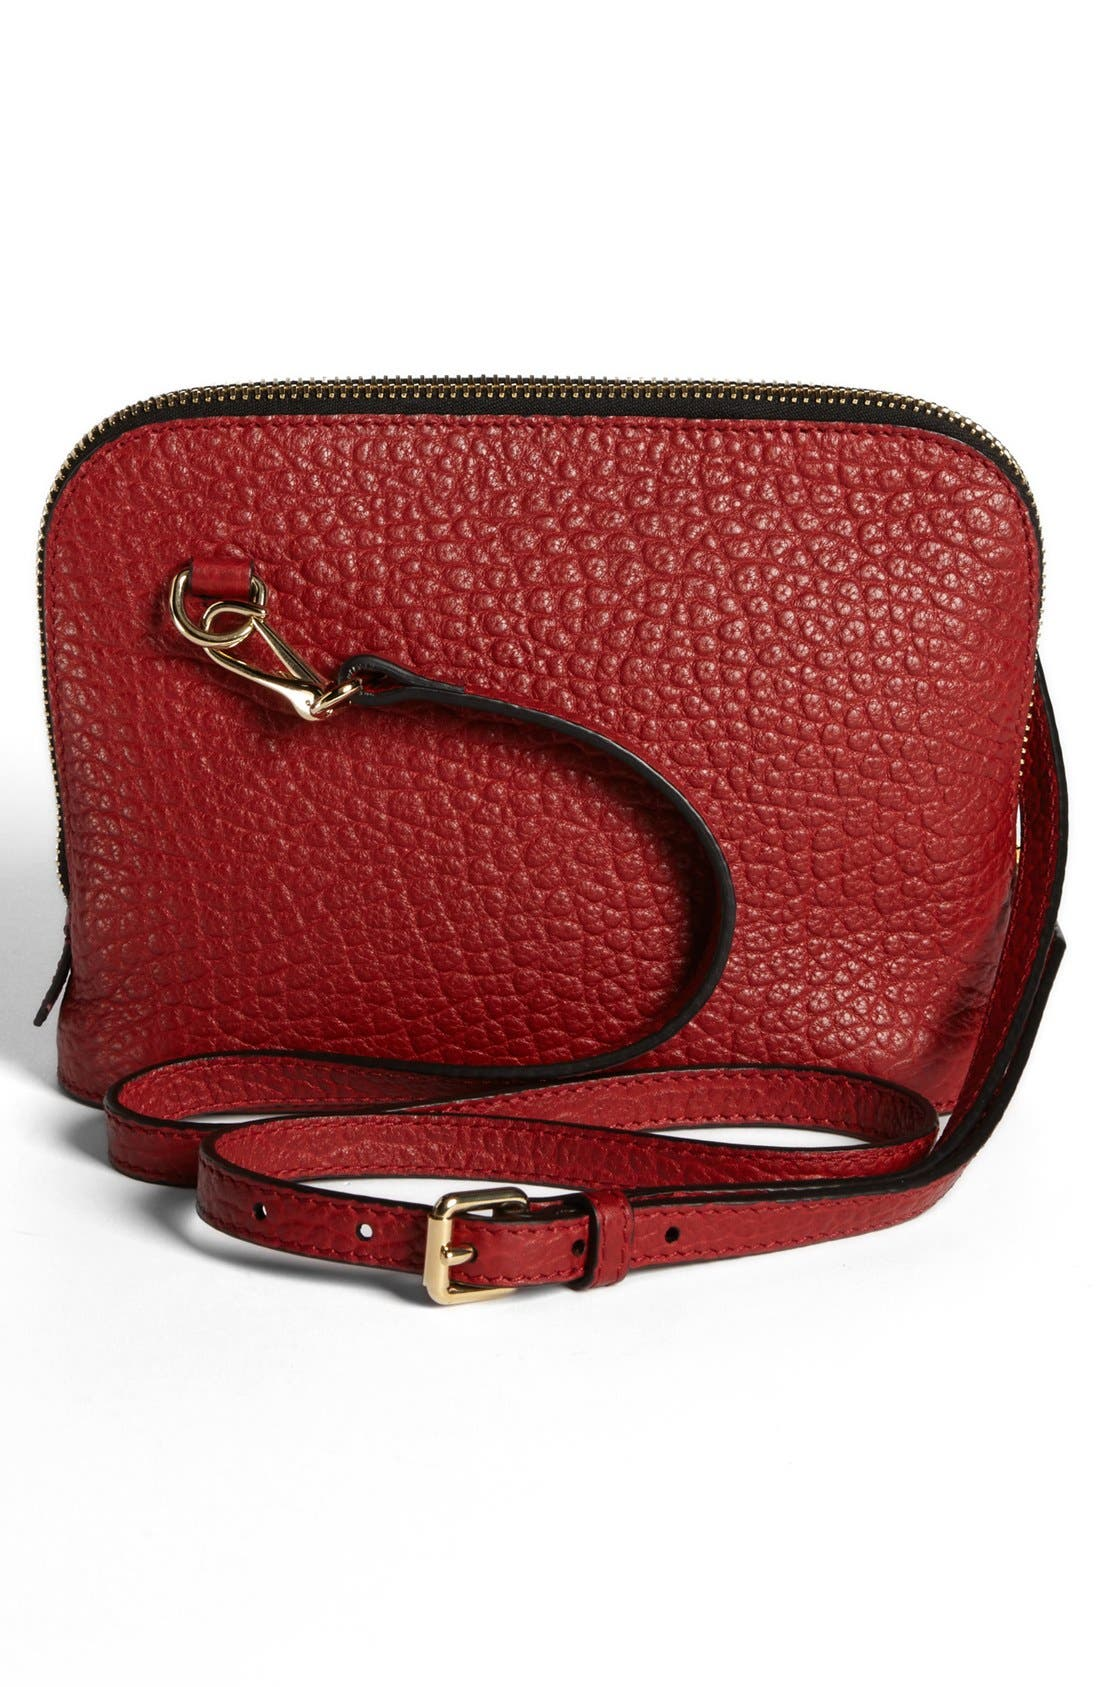 BURBERRY, 'Small Harrogate' Leather Crossbody Bag, Alternate thumbnail 2, color, 608